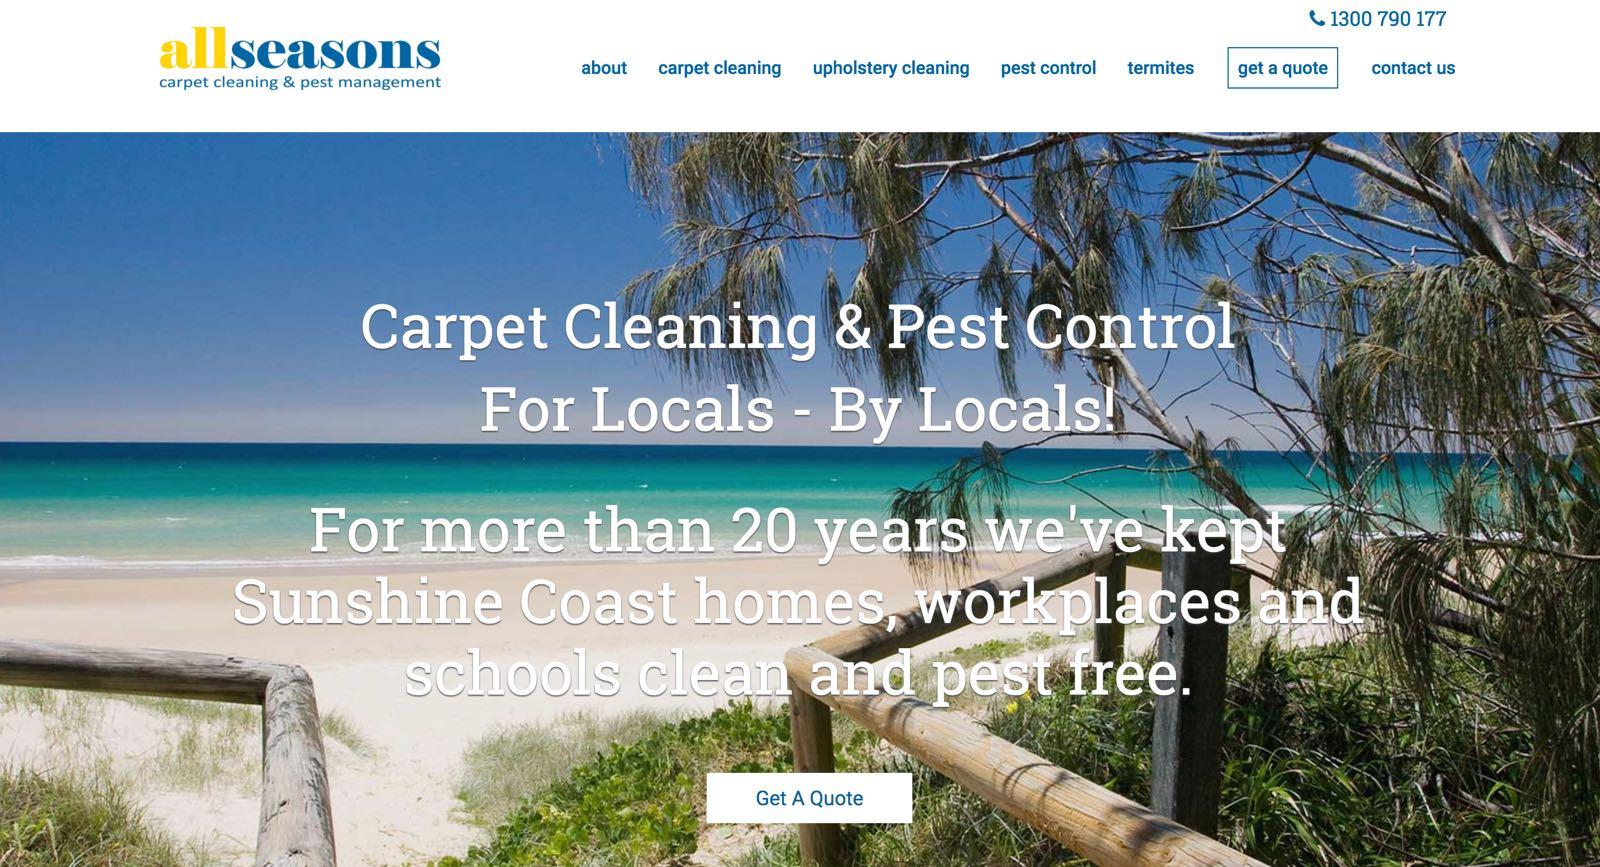 allseasons-website